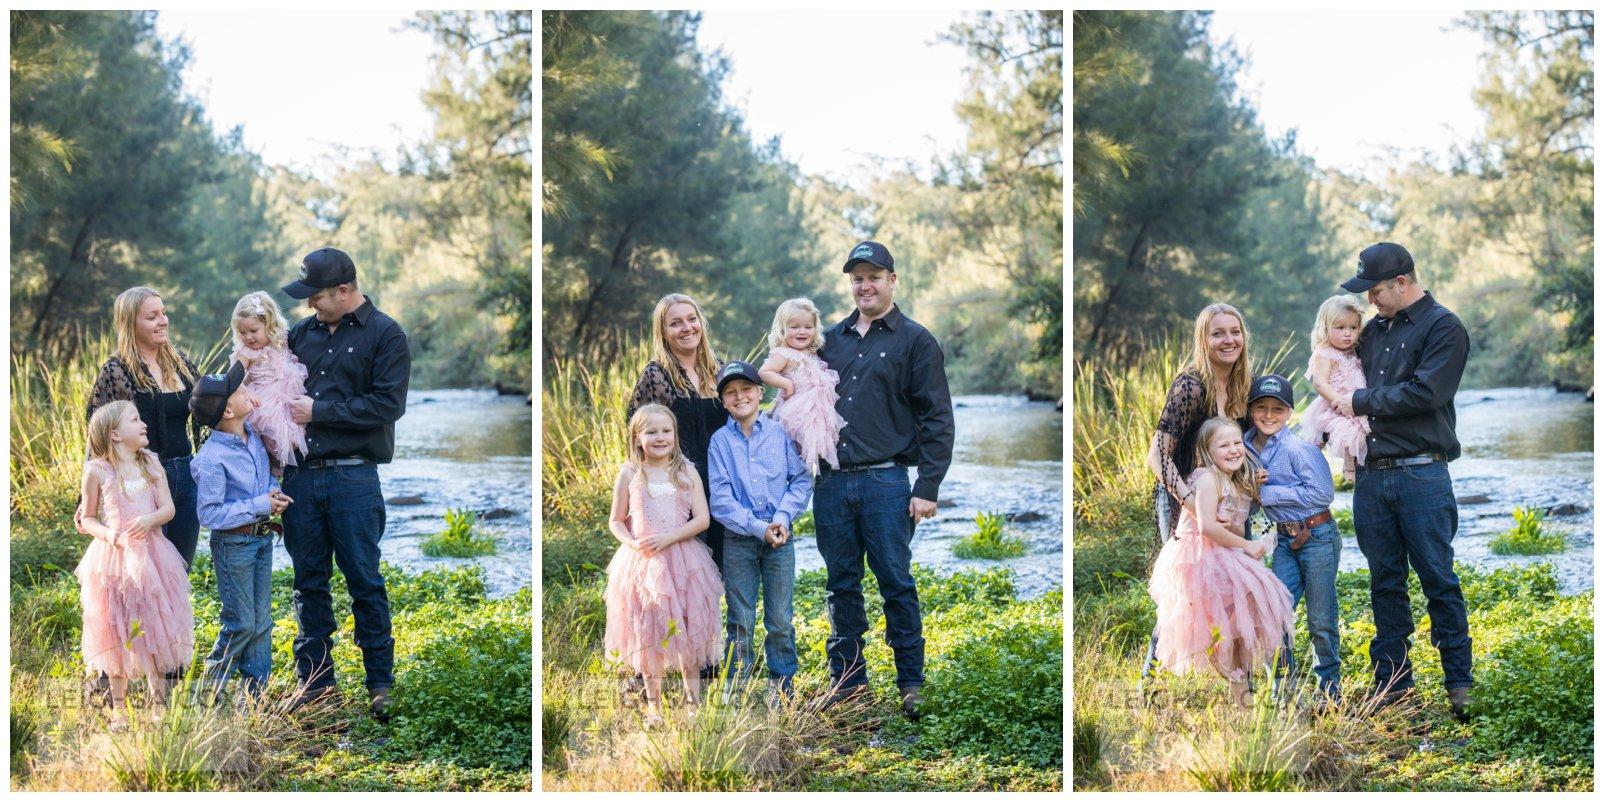 Gresford family Portraits